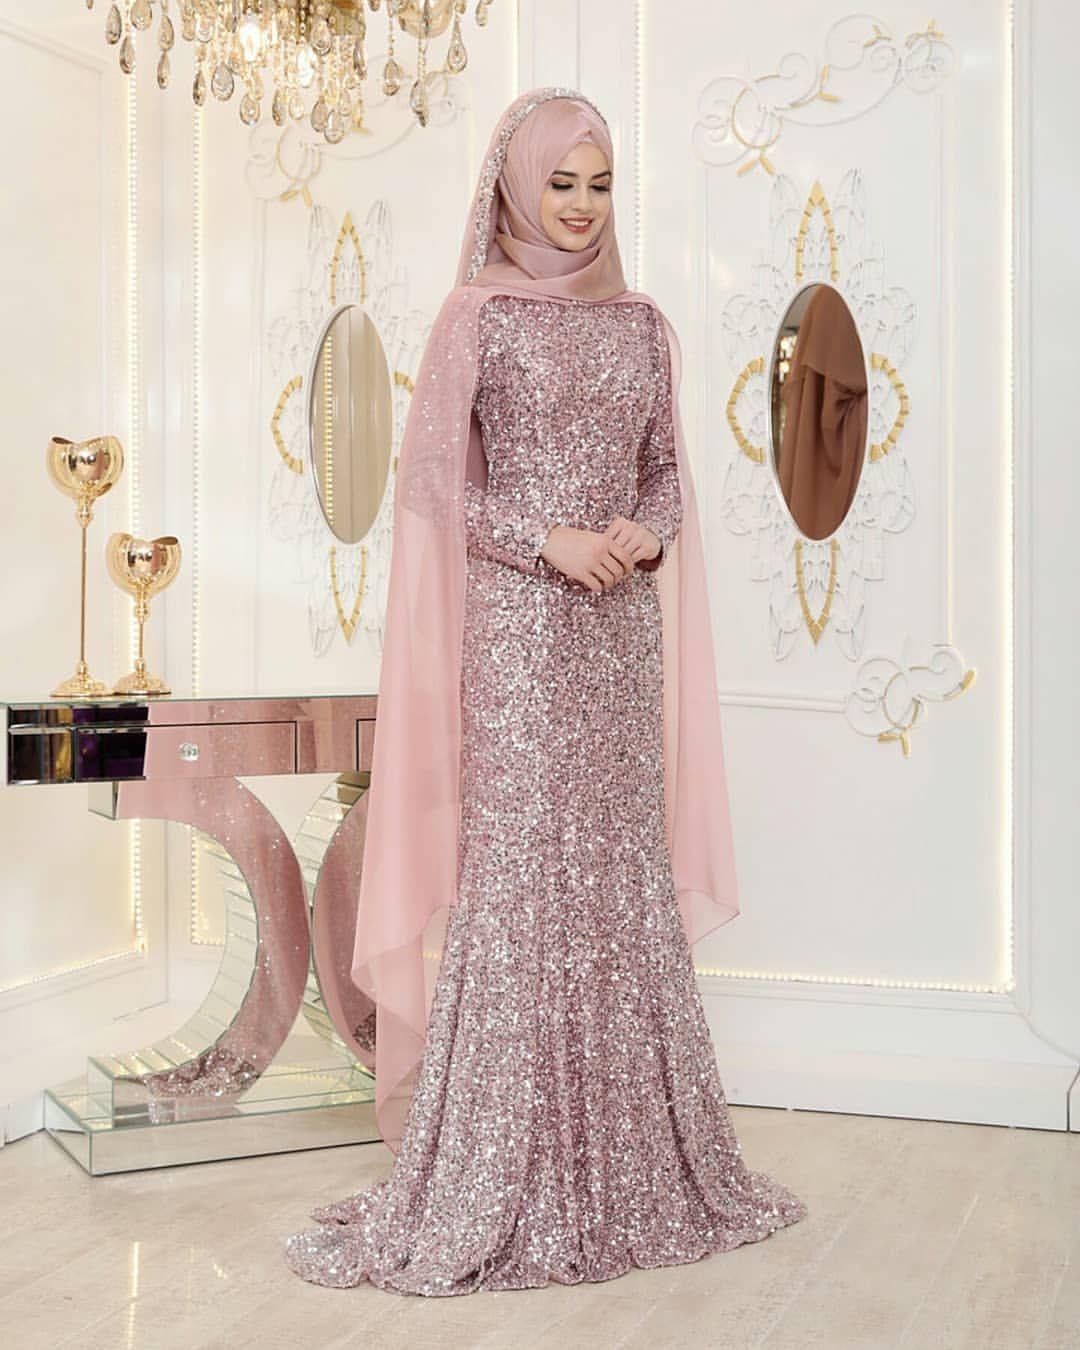 En Ucuz 2018 Abiye Elbise Modelleri Https Www Tesetturelbisesi Com En Ucuz 2018 Abiye Elbise Modelle Muslim Fashion Dress Hijab Evening Dress Islamic Dress